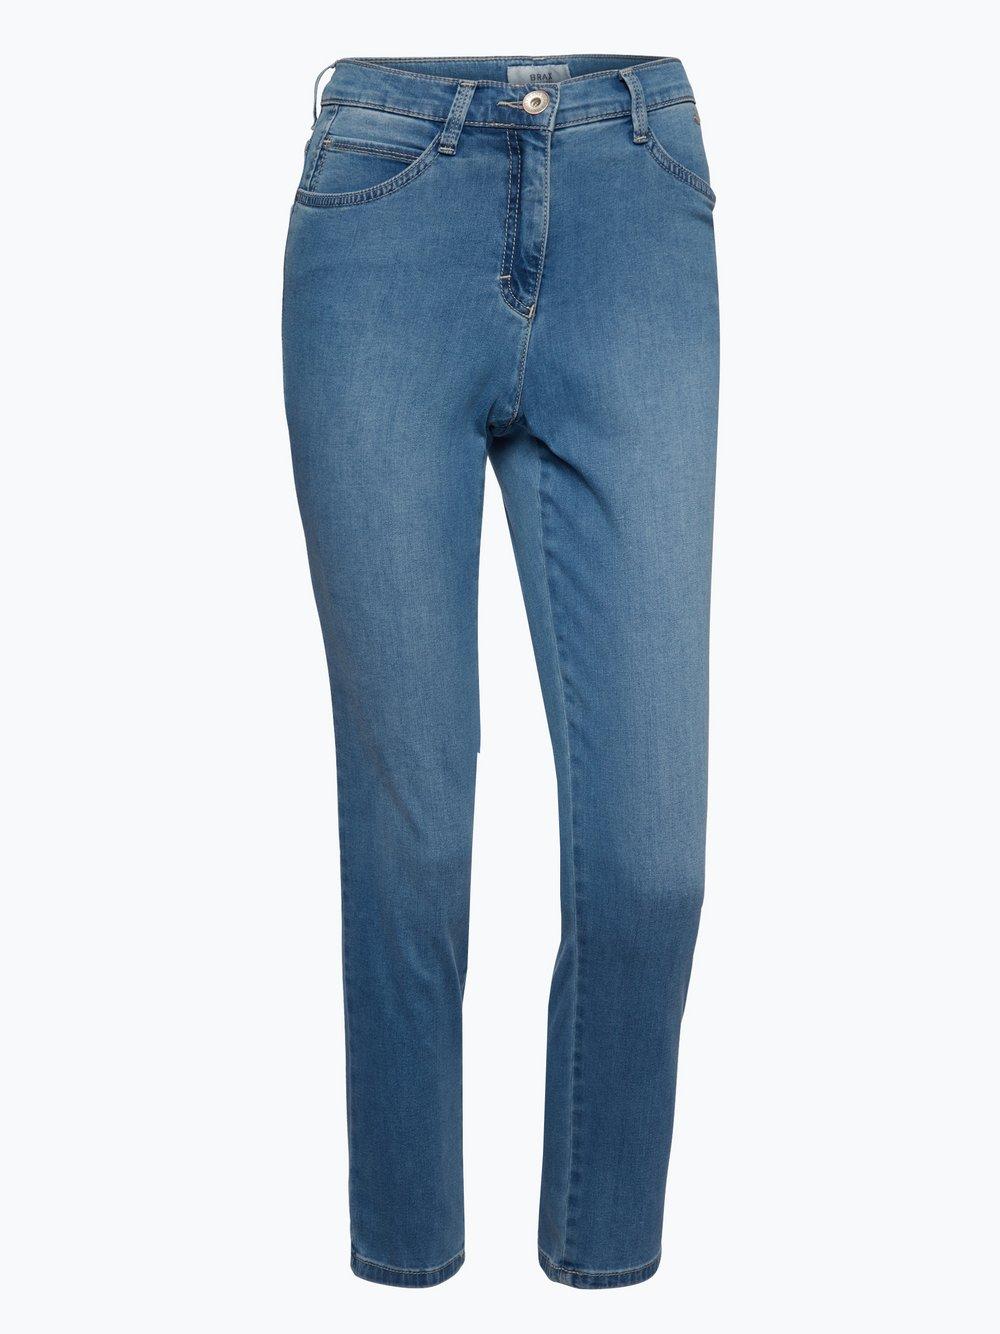 Brax damen jeans sara blue